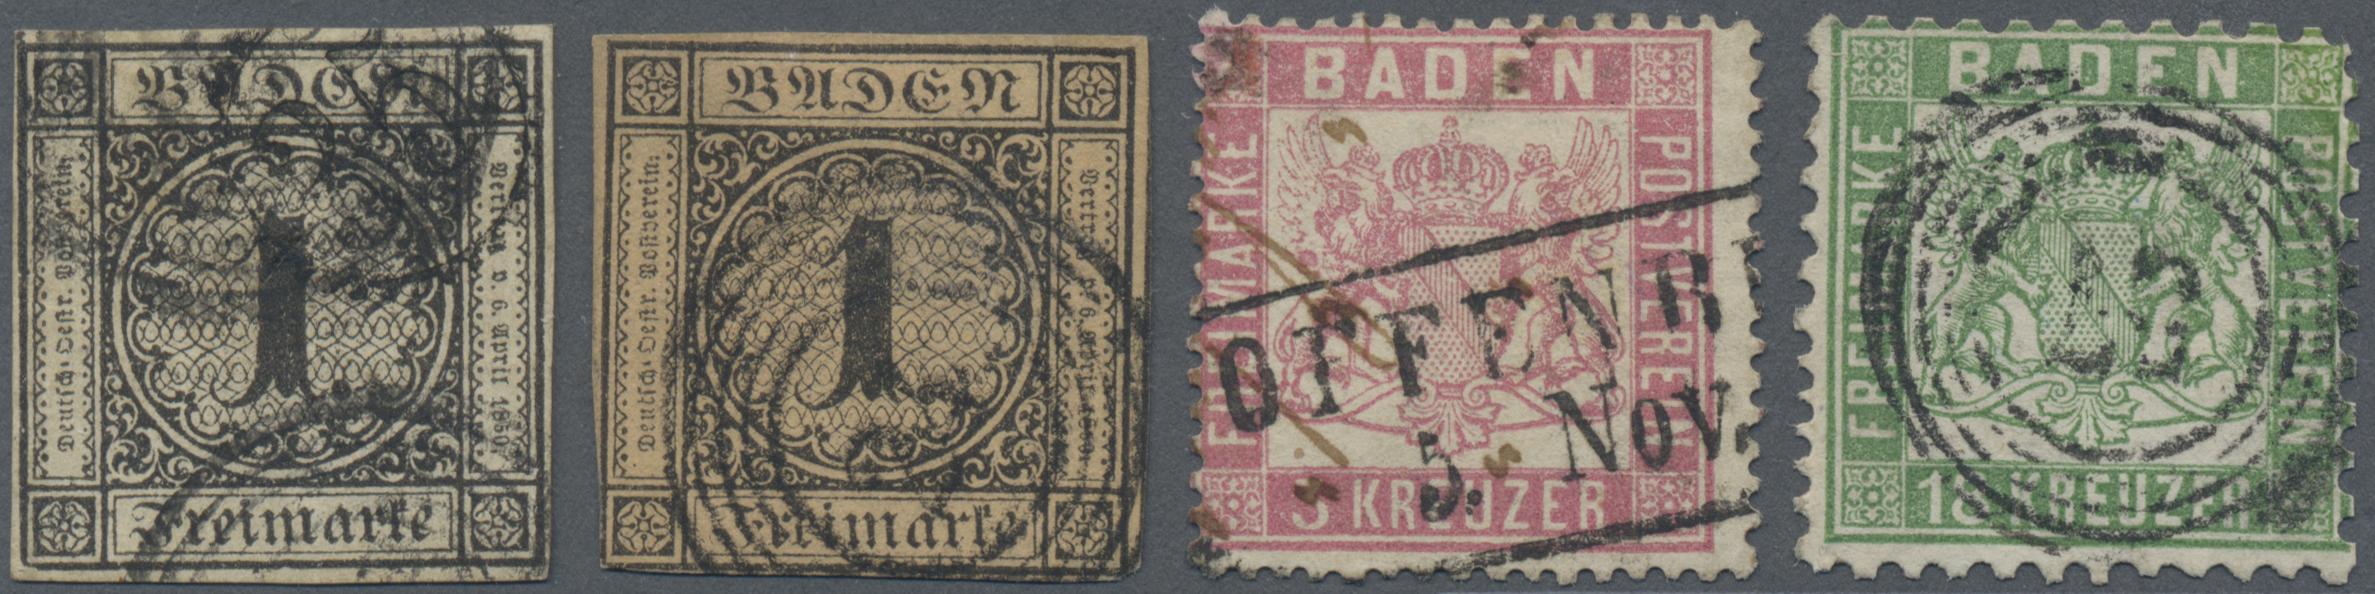 Lot 36152 - Baden - Marken und Briefe  -  Auktionshaus Christoph Gärtner GmbH & Co. KG Sale #44 Collections Germany